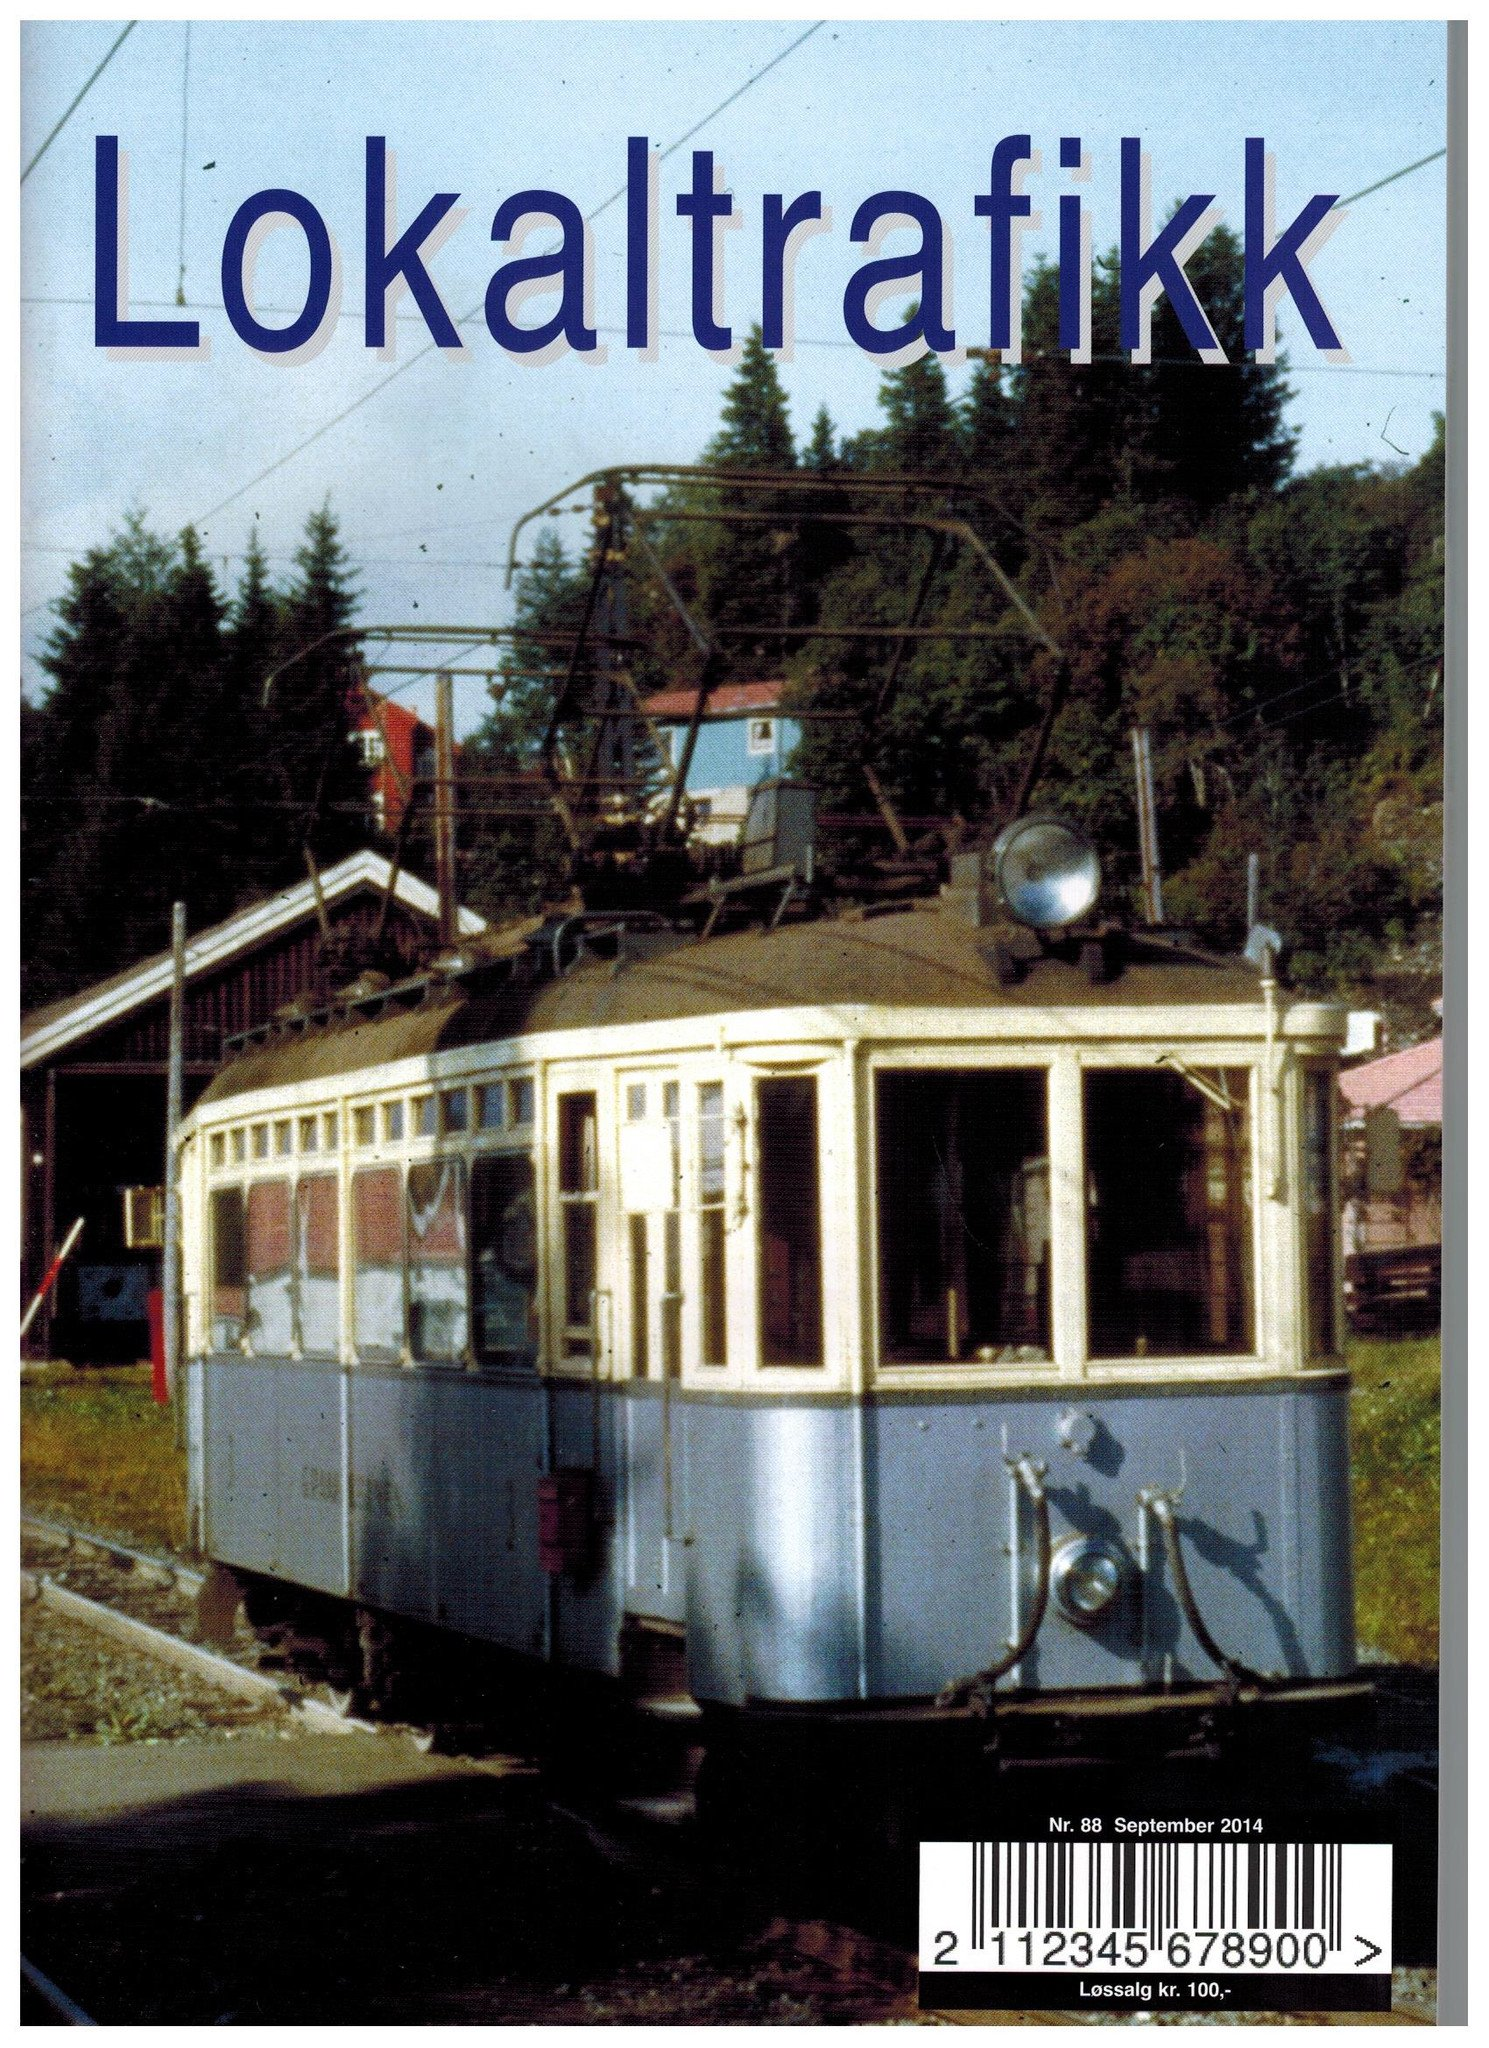 Lokaltrafikk #088